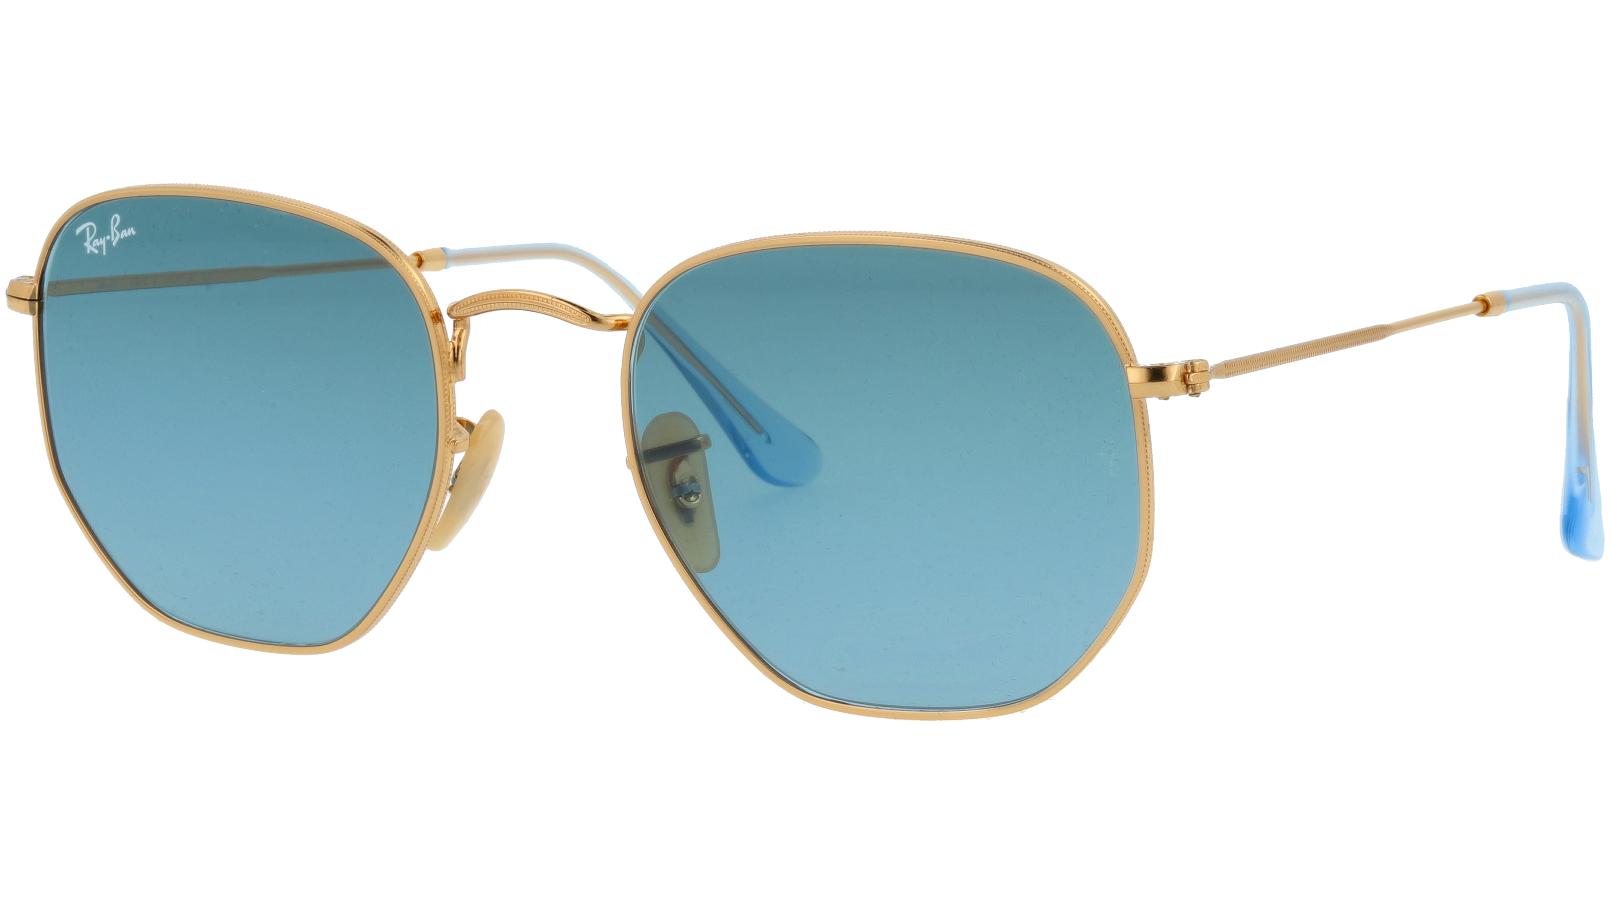 Ray-Ban RB3548N 91233M Arista Polarized Sunglasses